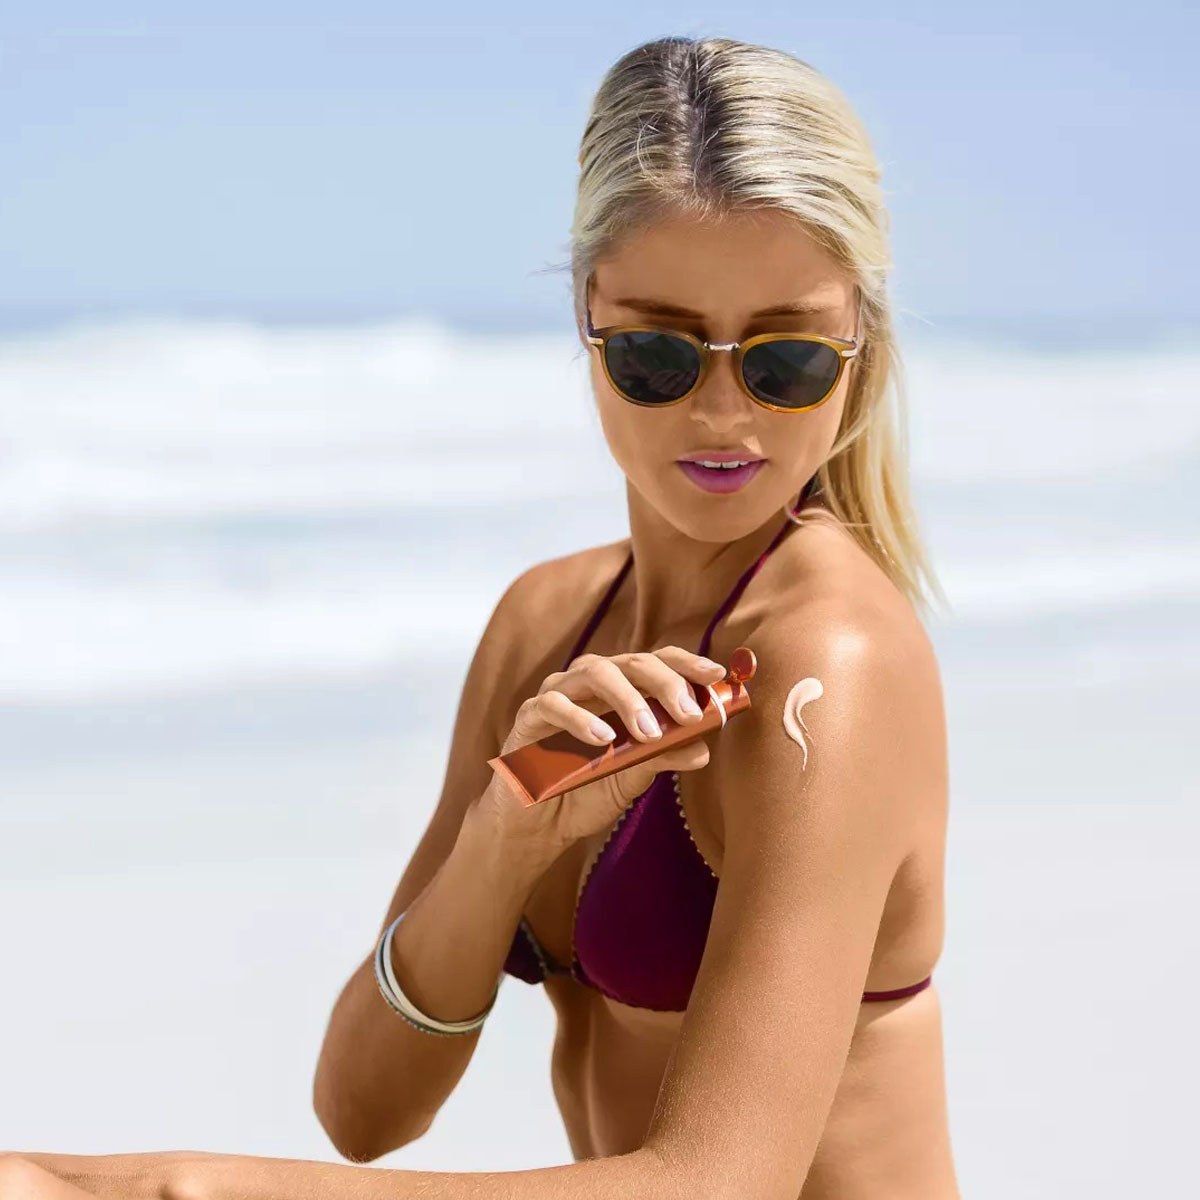 Natural Instinct Sunscreen Tinted Face 100g_media-02